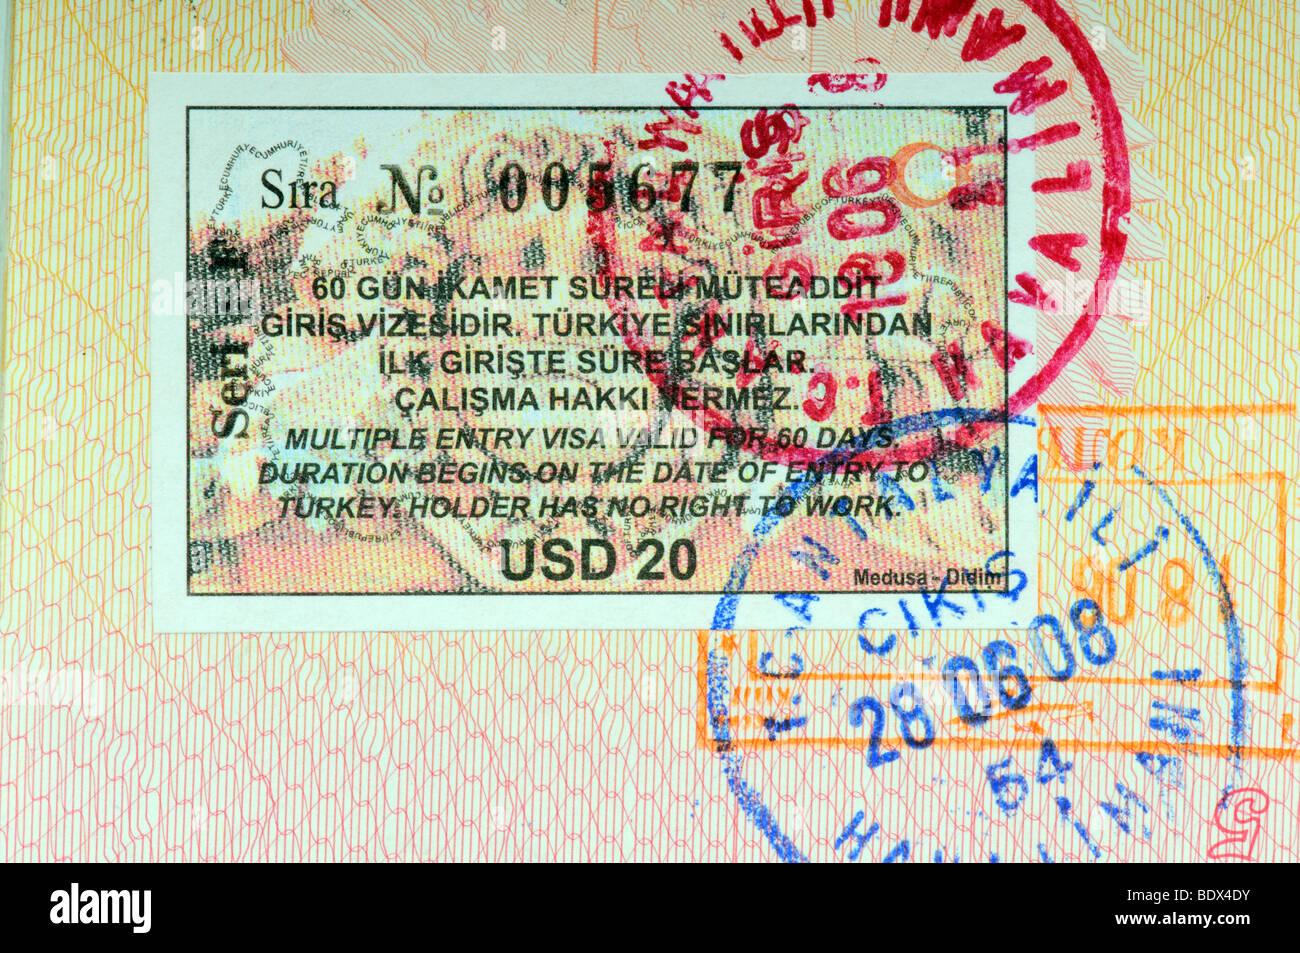 Turkey visa in international passport - Stock Image